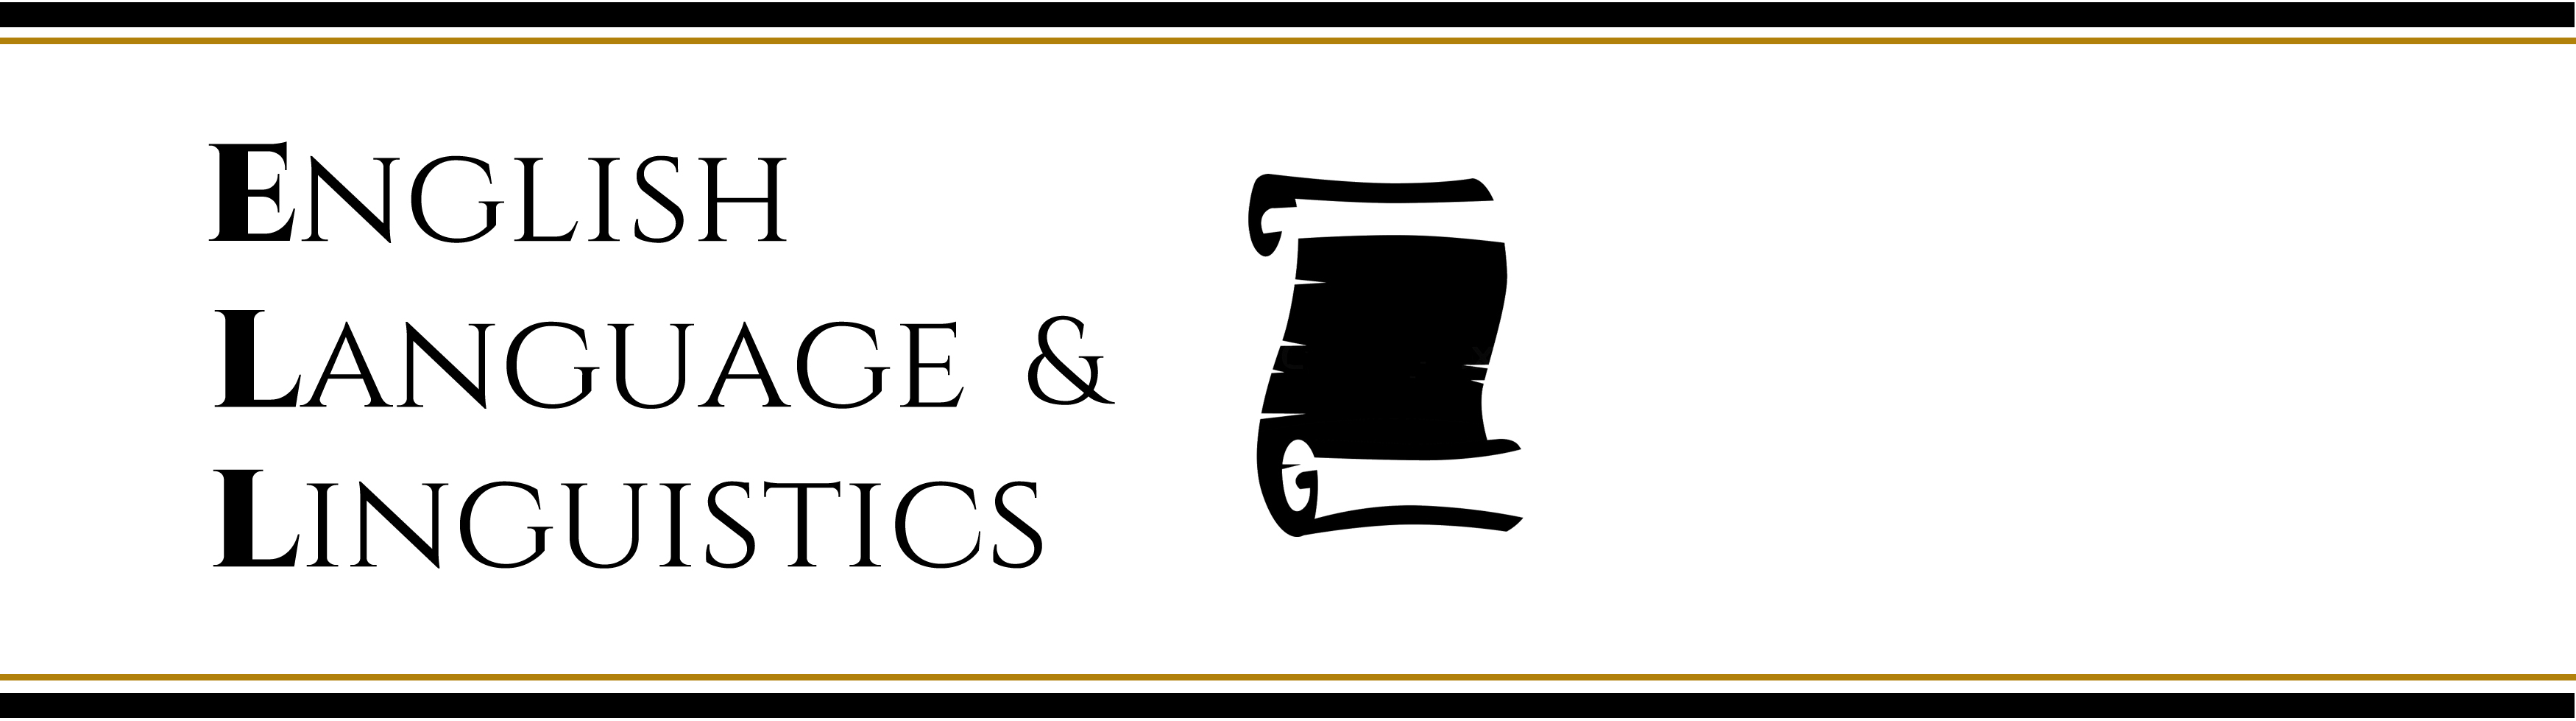 English Language and Linguistics // Purdue College of Liberal Arts